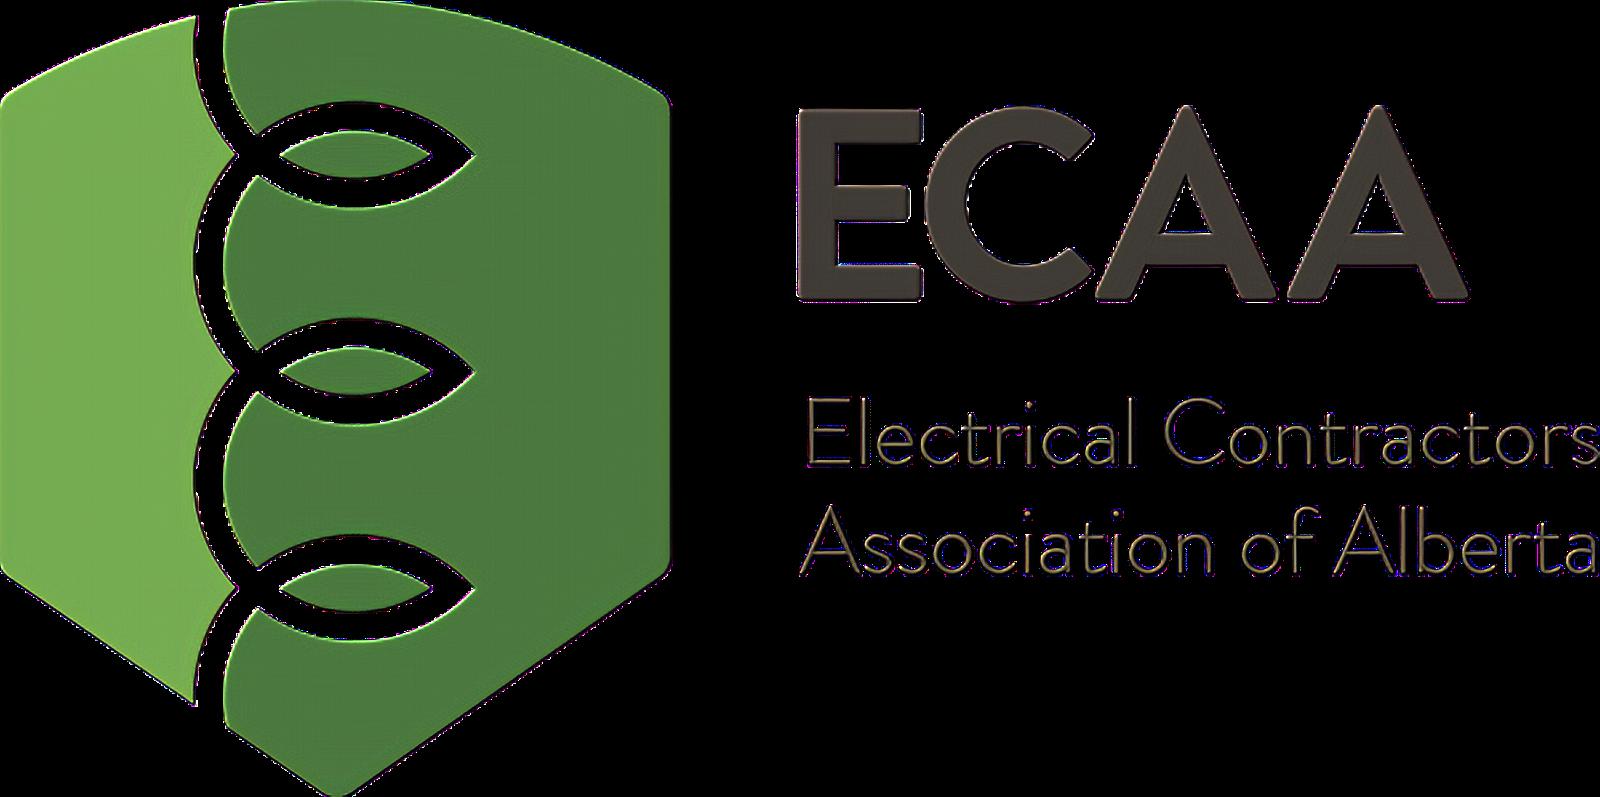 Electrical Contractors Association of Alberta | ECAA